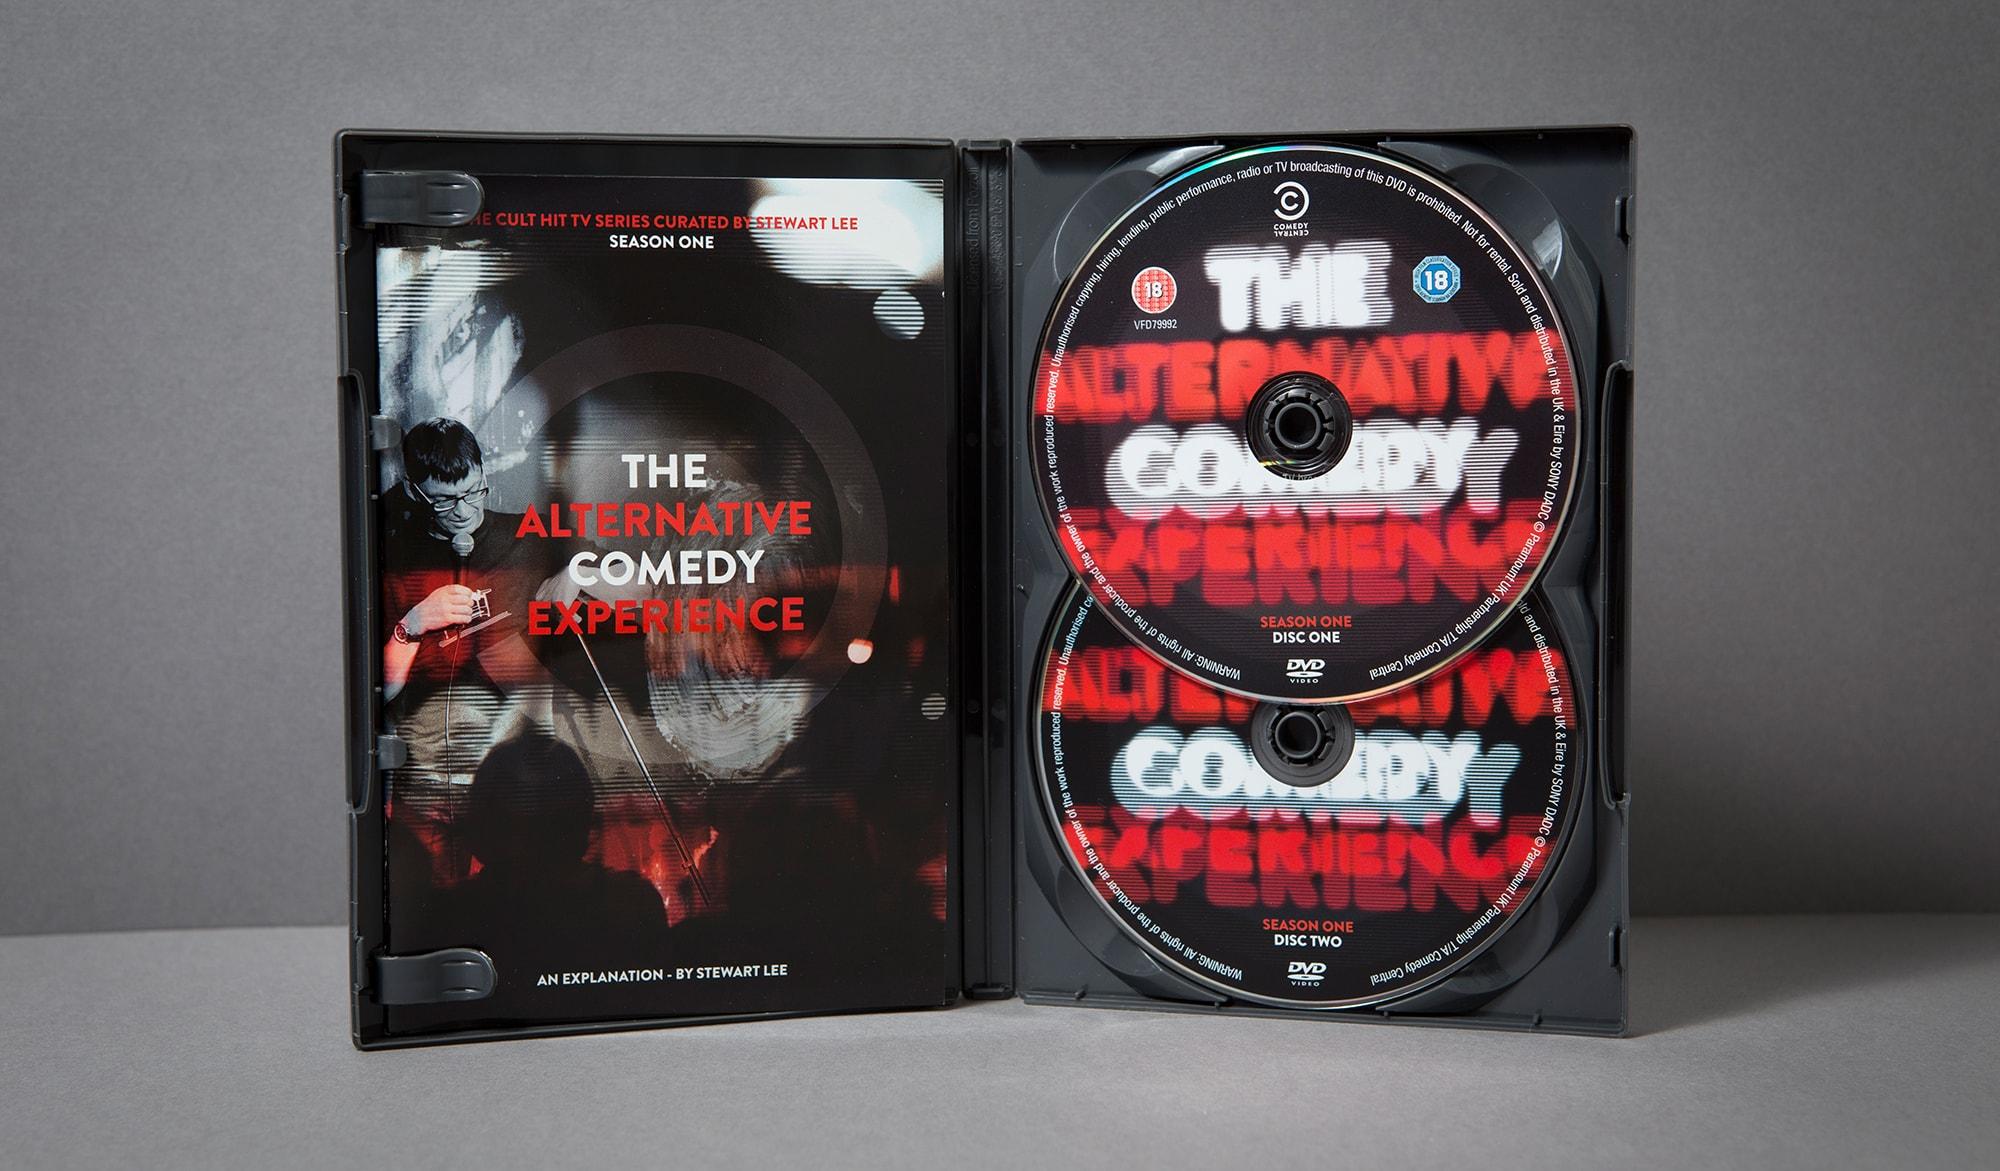 The Alternative Comedy Experience - DVD